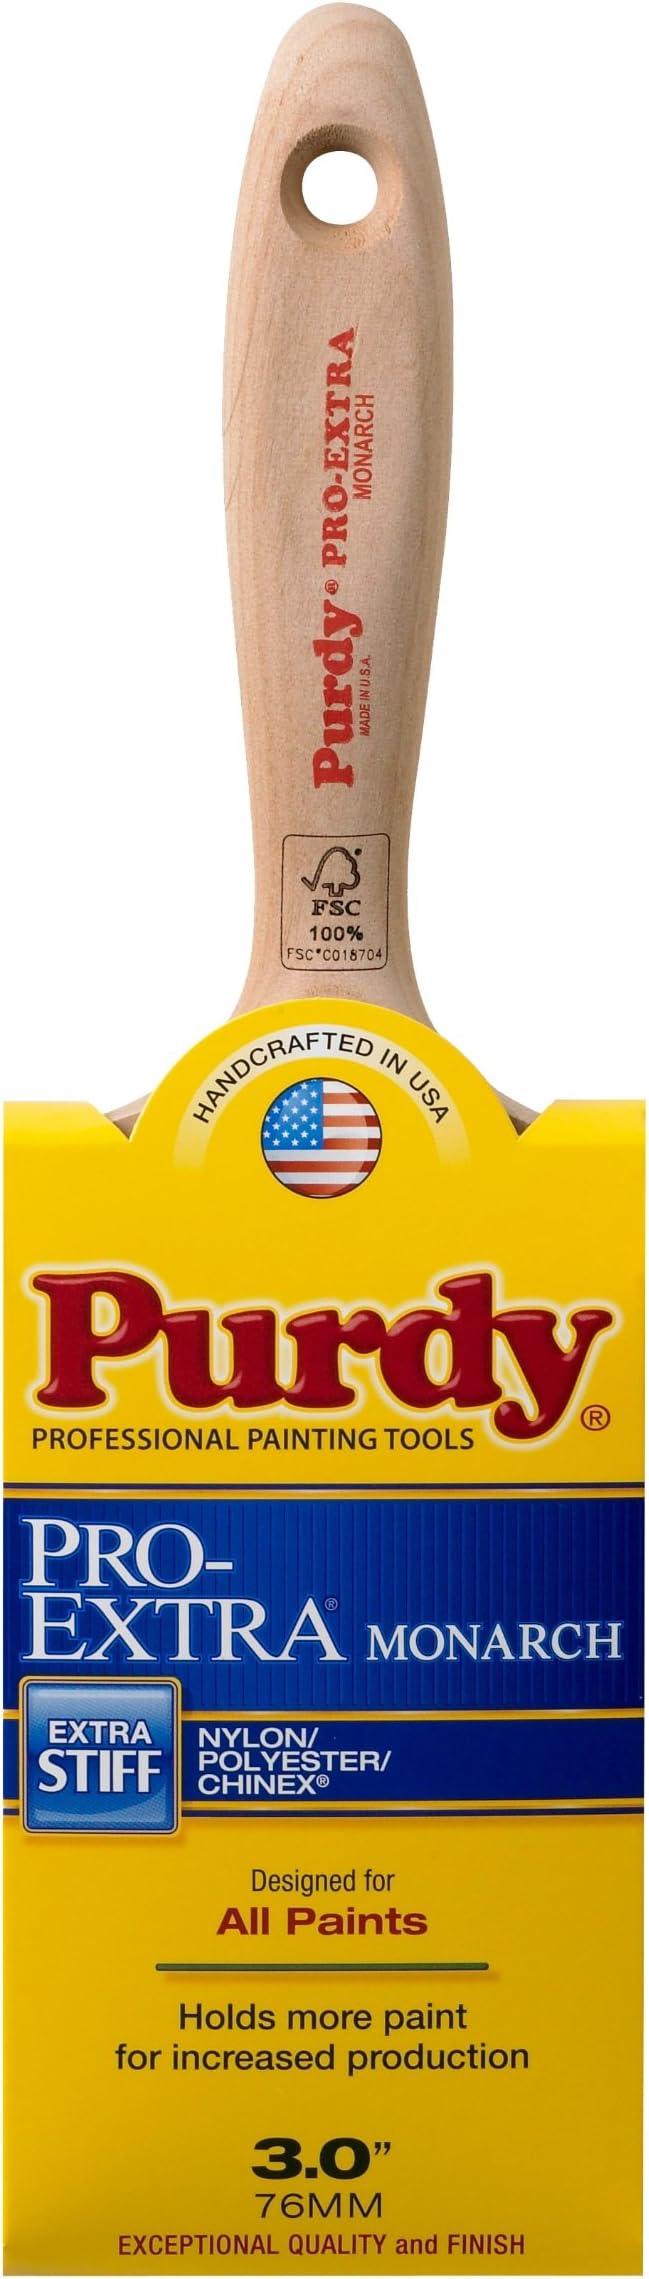 environ 2.54 cm Purdy ® PUR144234010 XL ™ Elite ™ Monarch ™ Pinceau 1 in